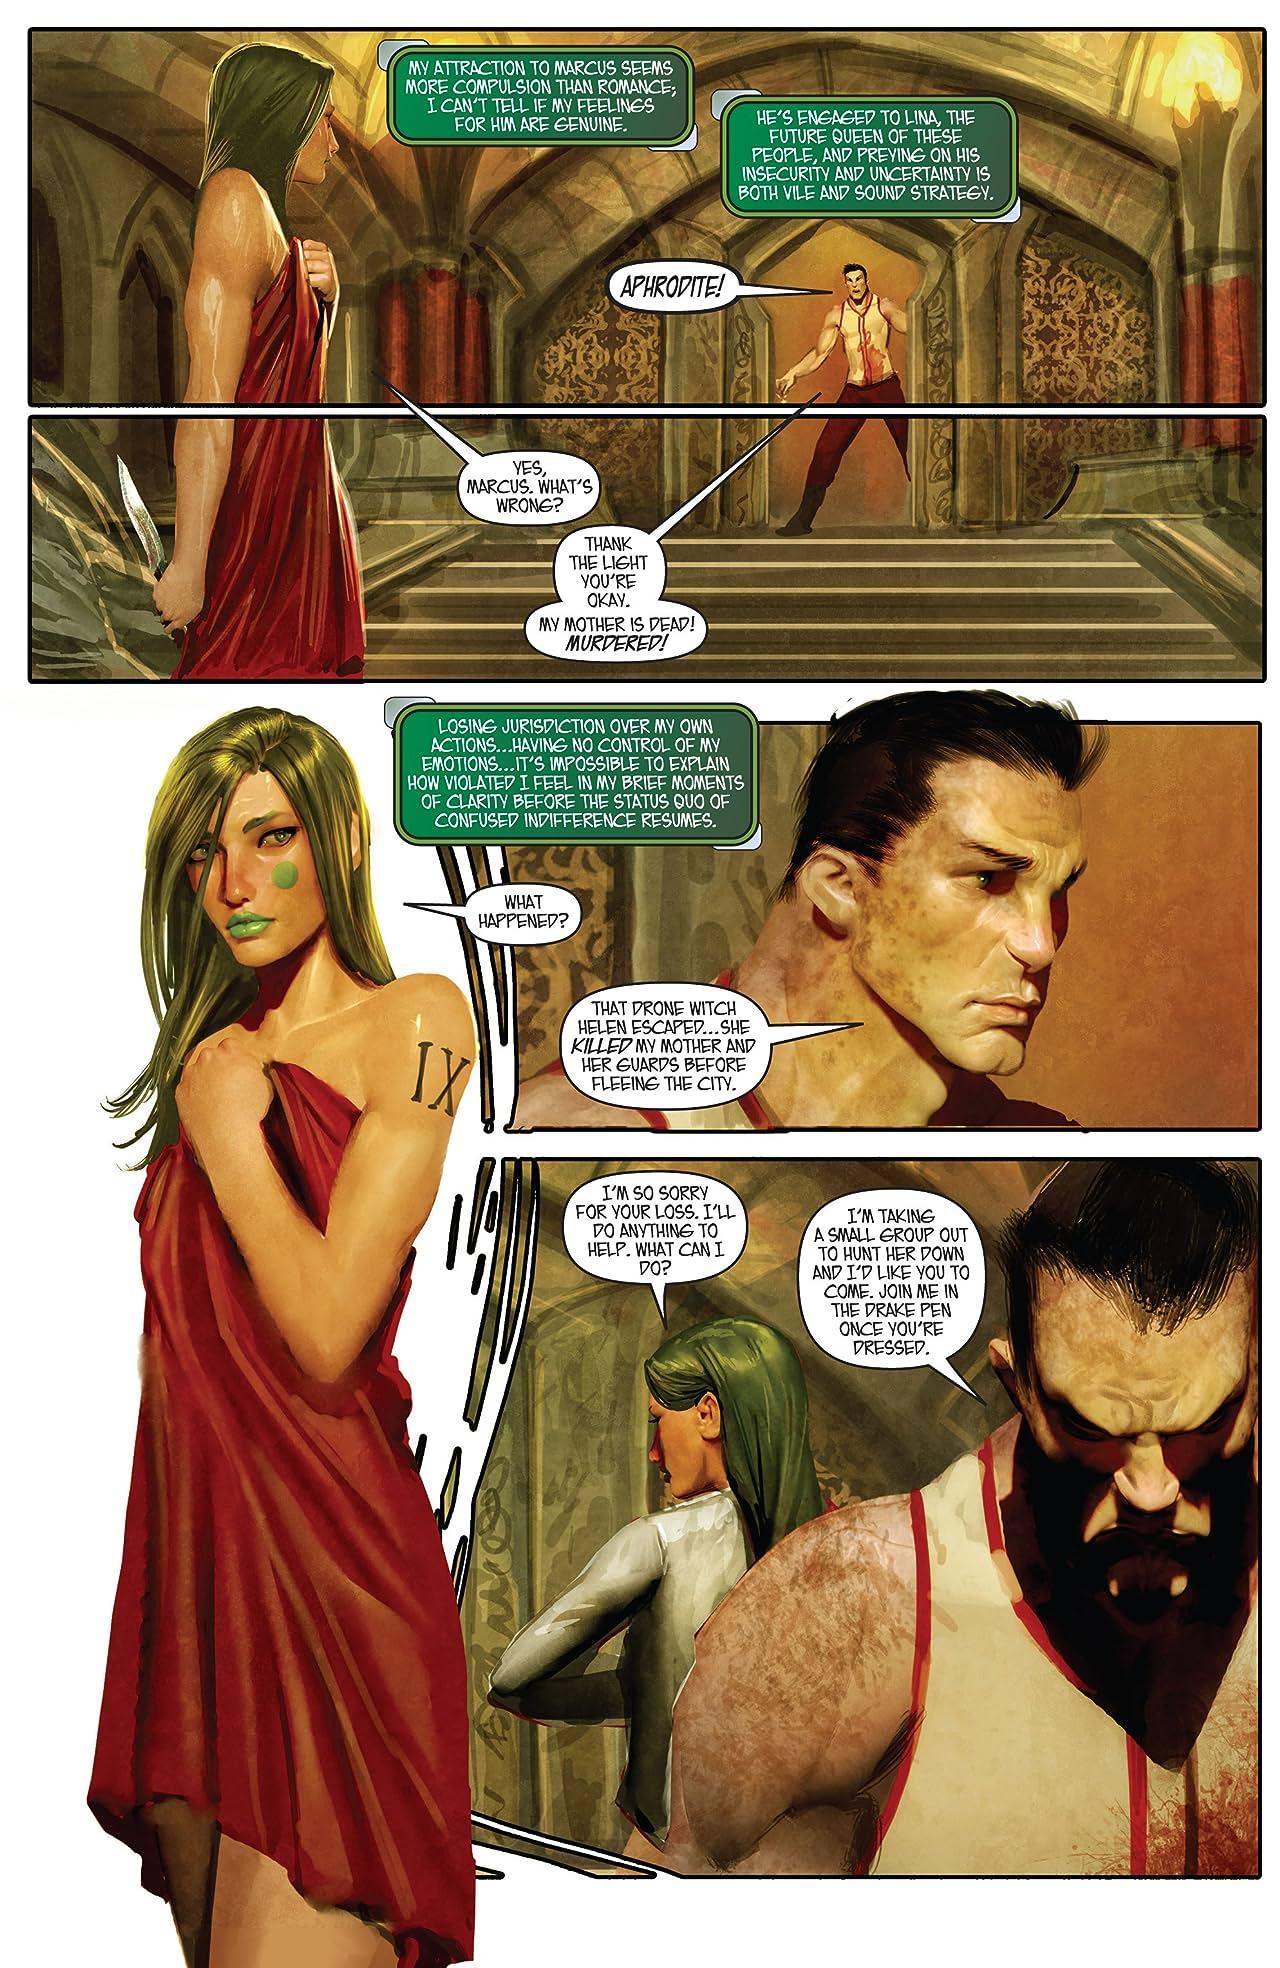 Aphrodite IX Vol. 2 #3